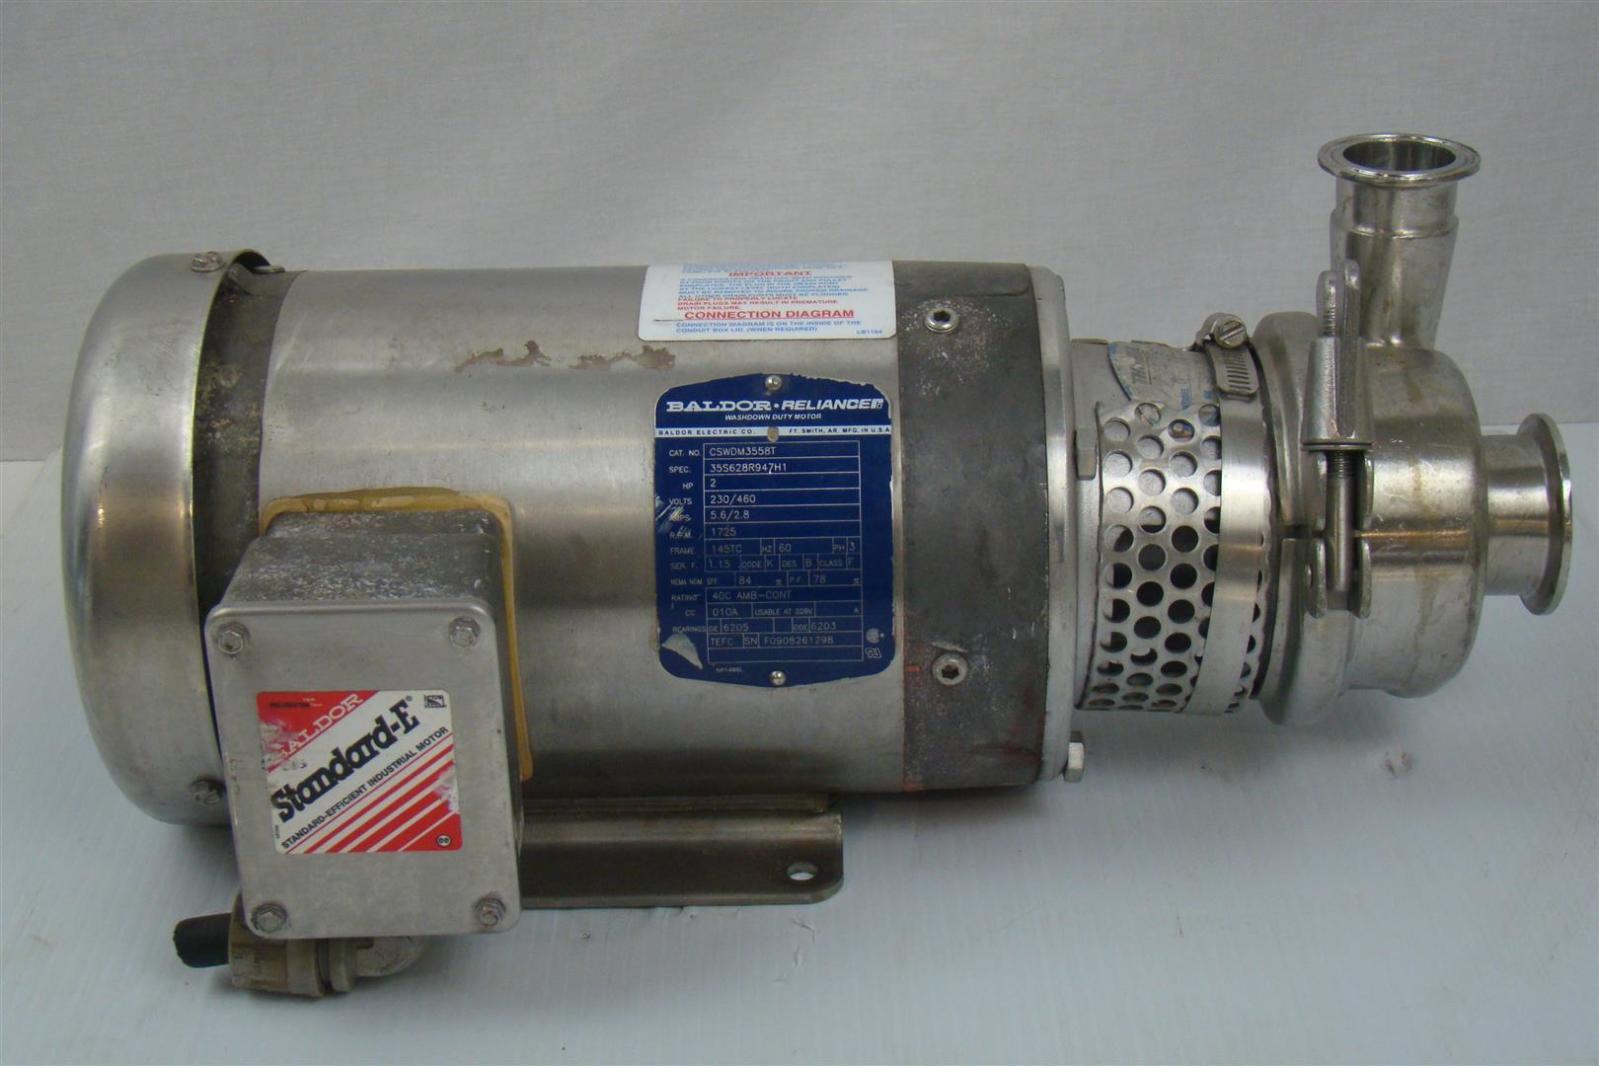 Baldor Cswdm3558t Motor 2hp 1725rpm W Thomsen 49822 Ga